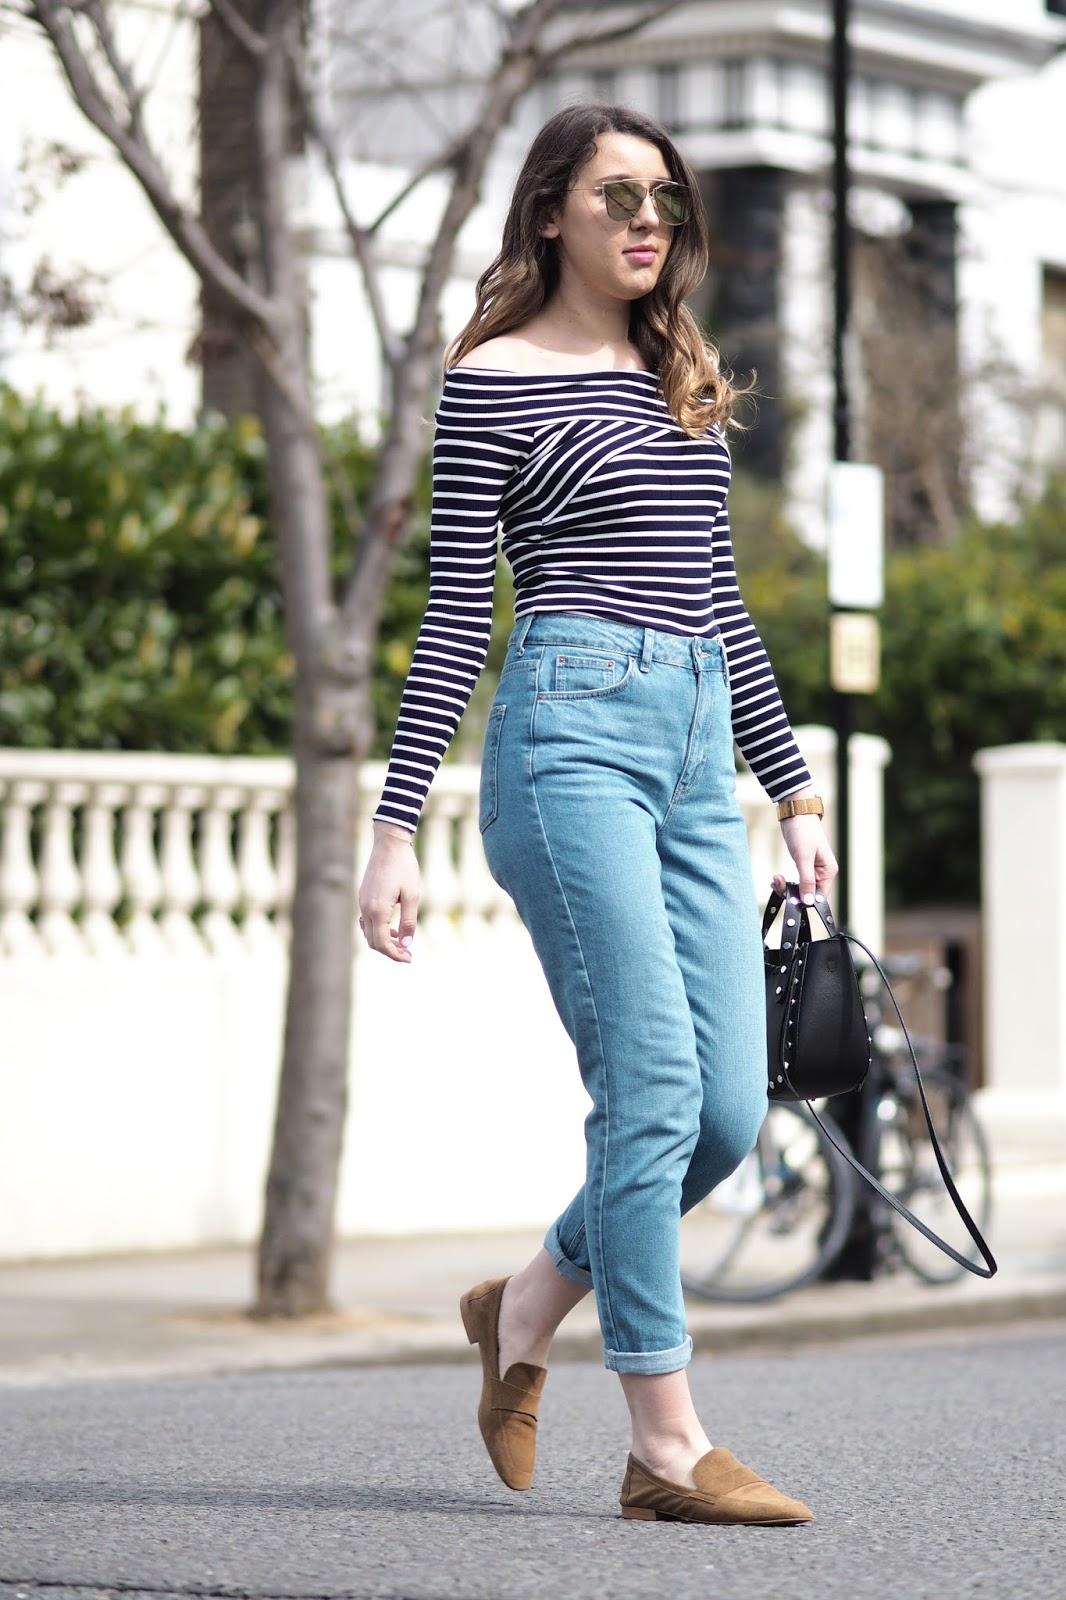 topshop 39 mom 39 jeans what 39 s in her wardrobe. Black Bedroom Furniture Sets. Home Design Ideas